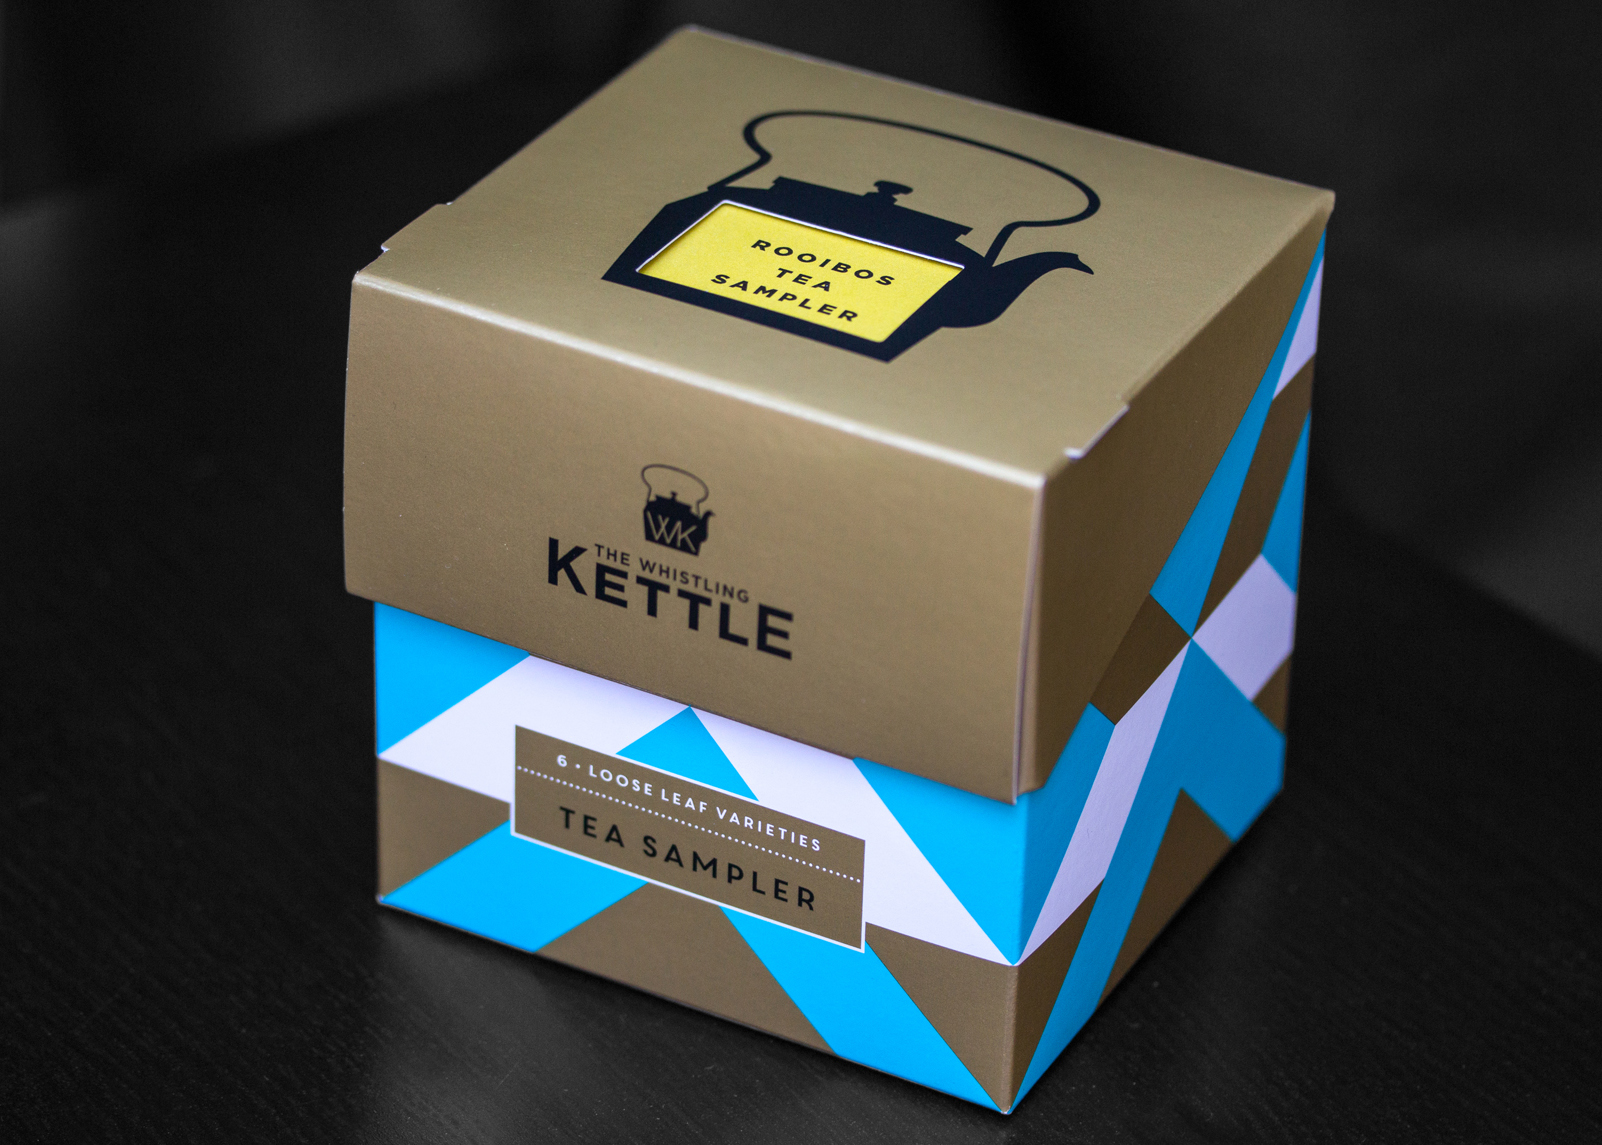 One of the Whistling Kettle Tea Sampler boxes